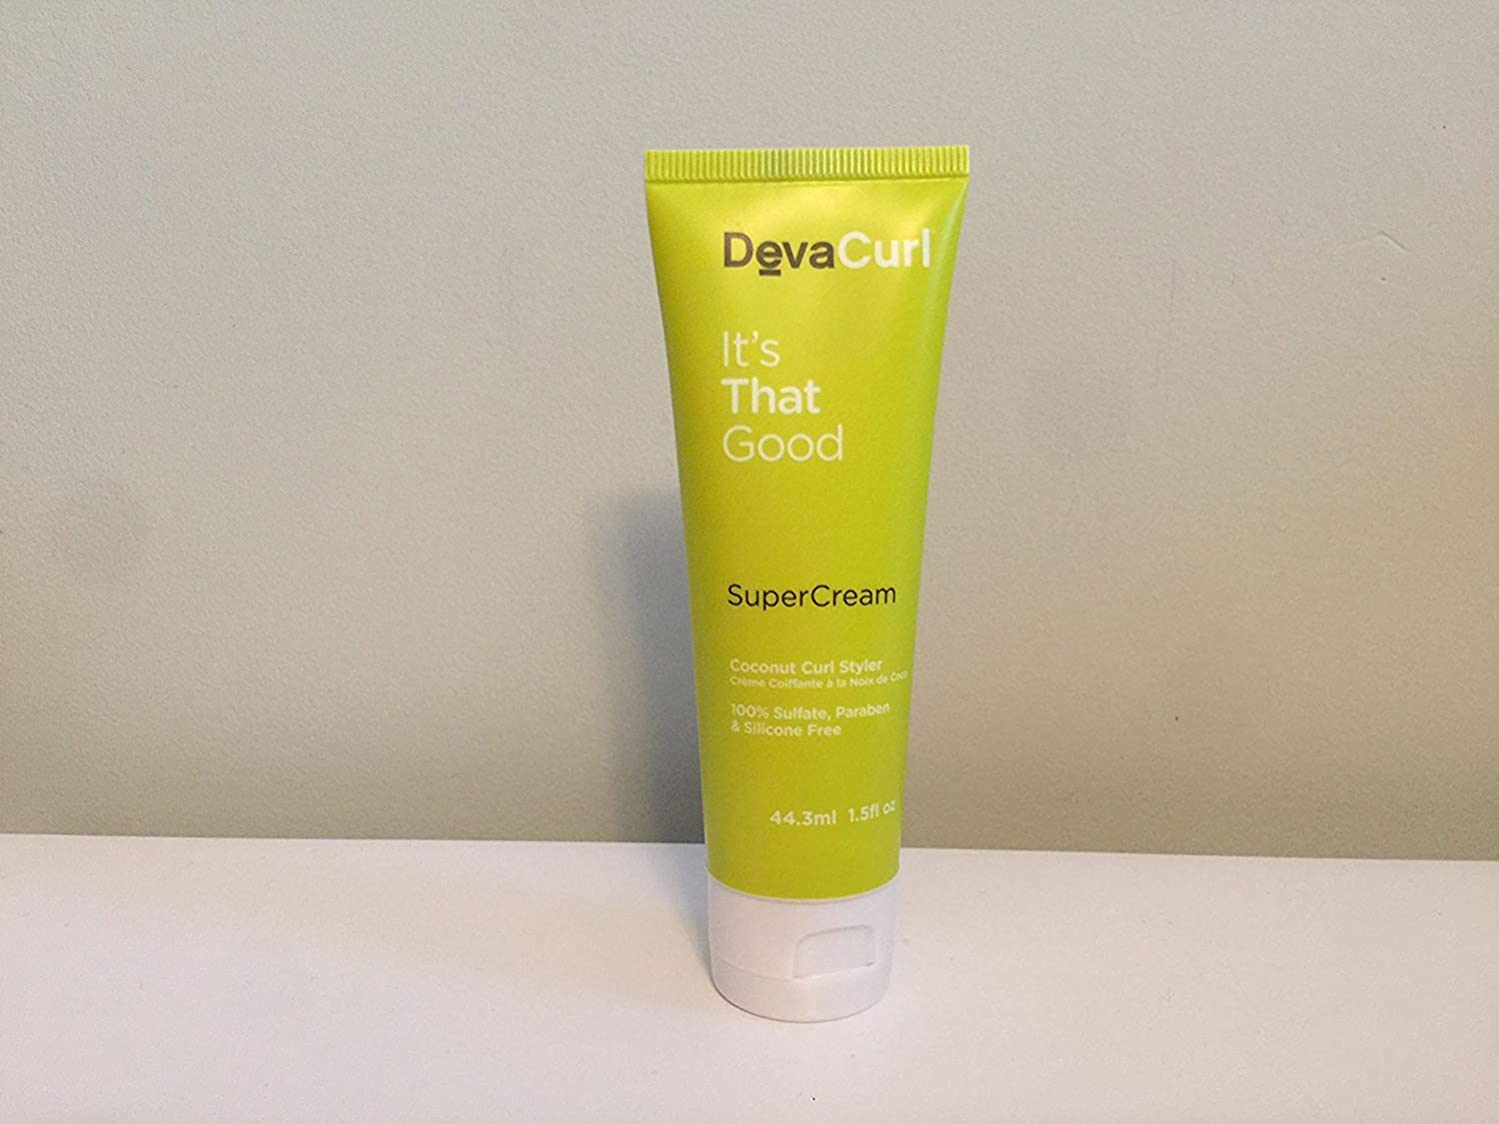 DevaCurl SuperCream Coconut Curl Styler, Deluxe Travel Size, 1.5 oz